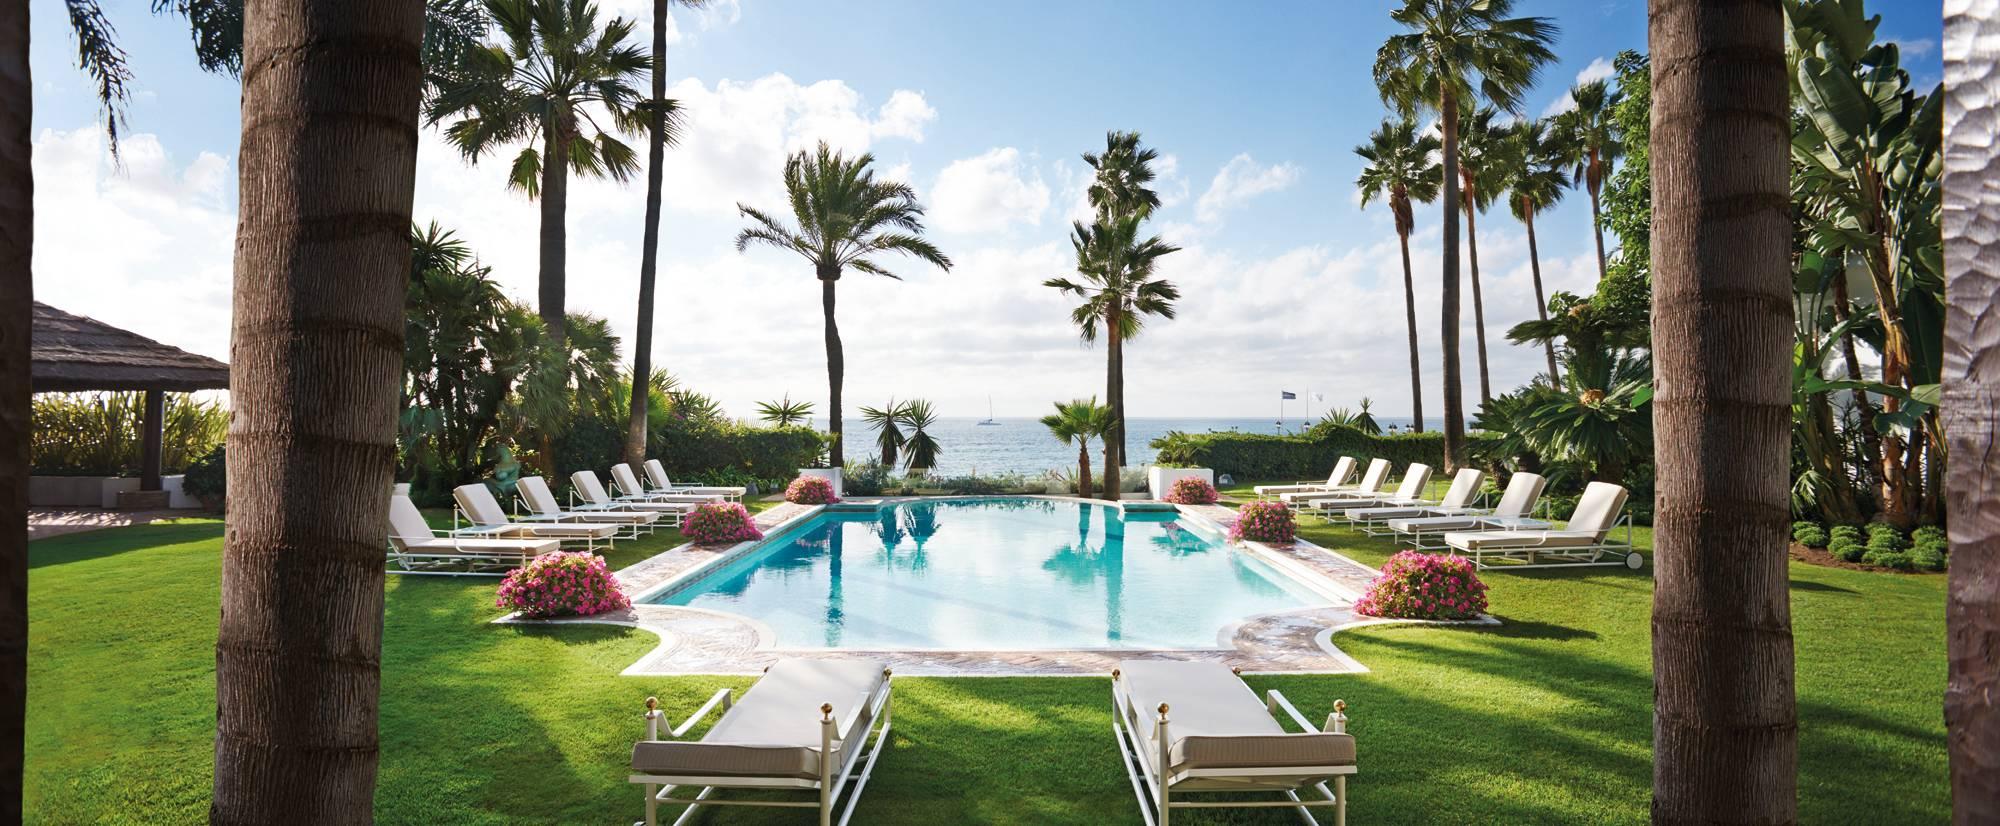 Marbella Club Villa del Mar - Pool Sea View